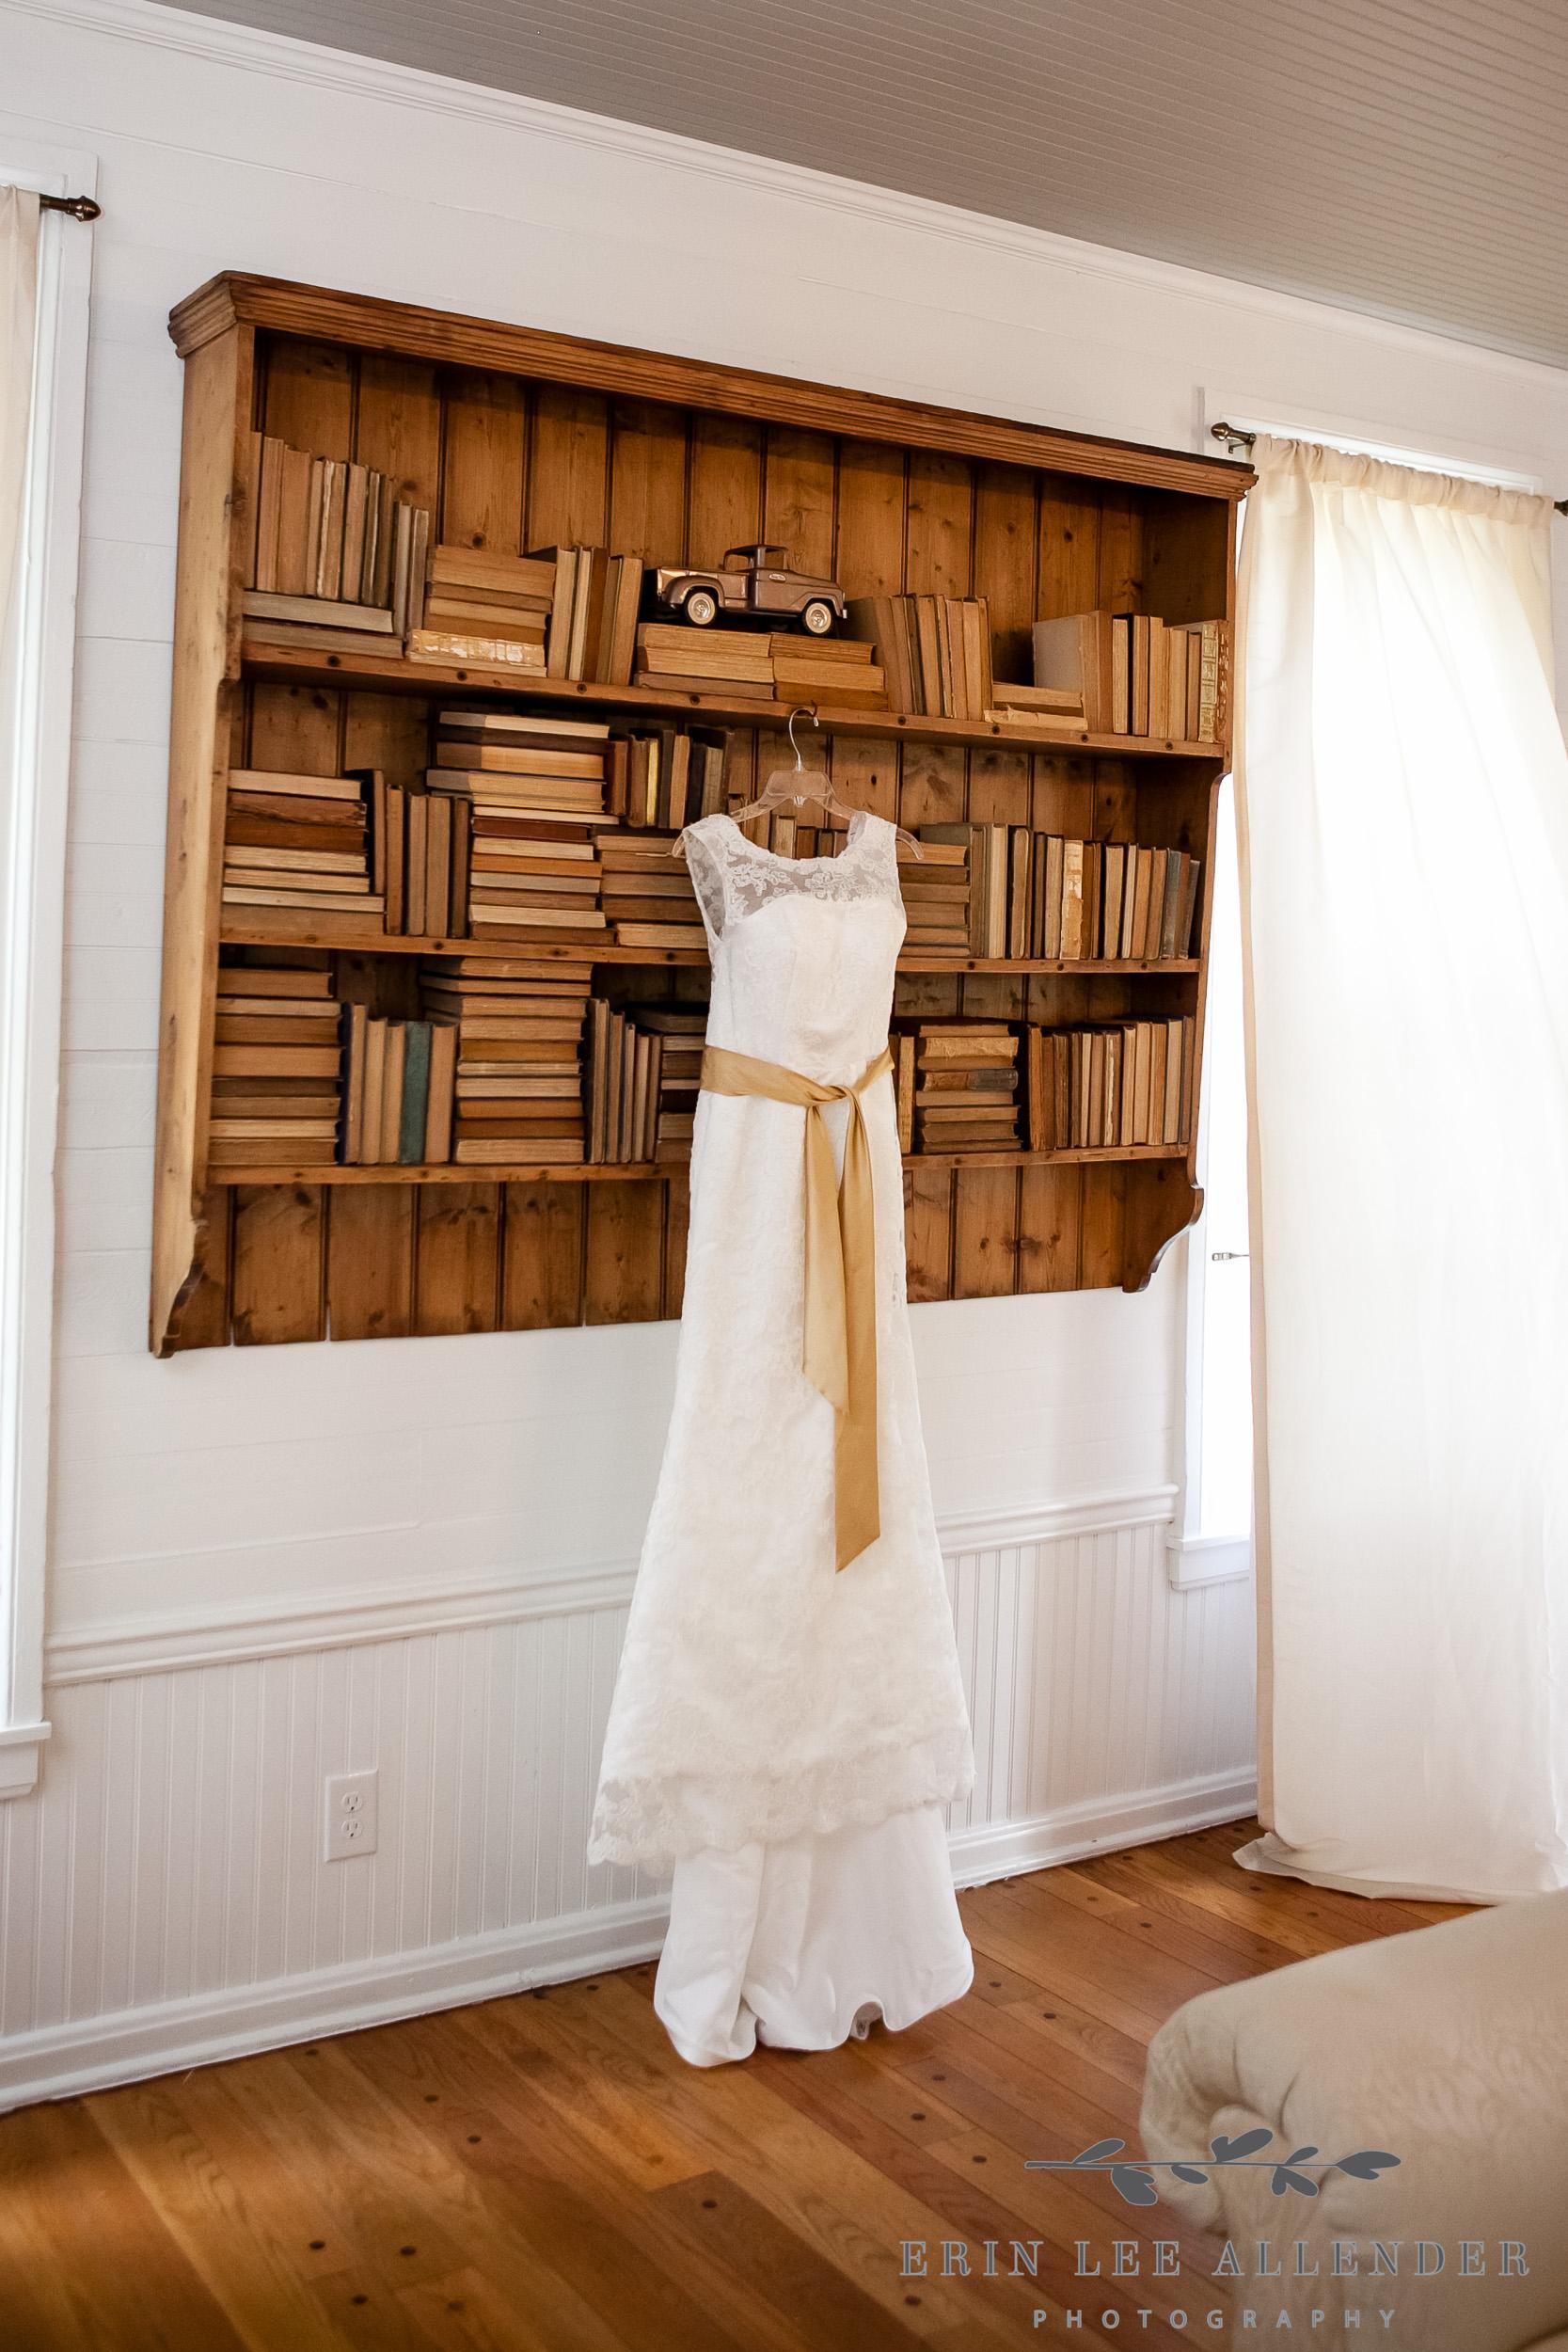 Wedding_Dress_Hanging_On_Book_Shelf